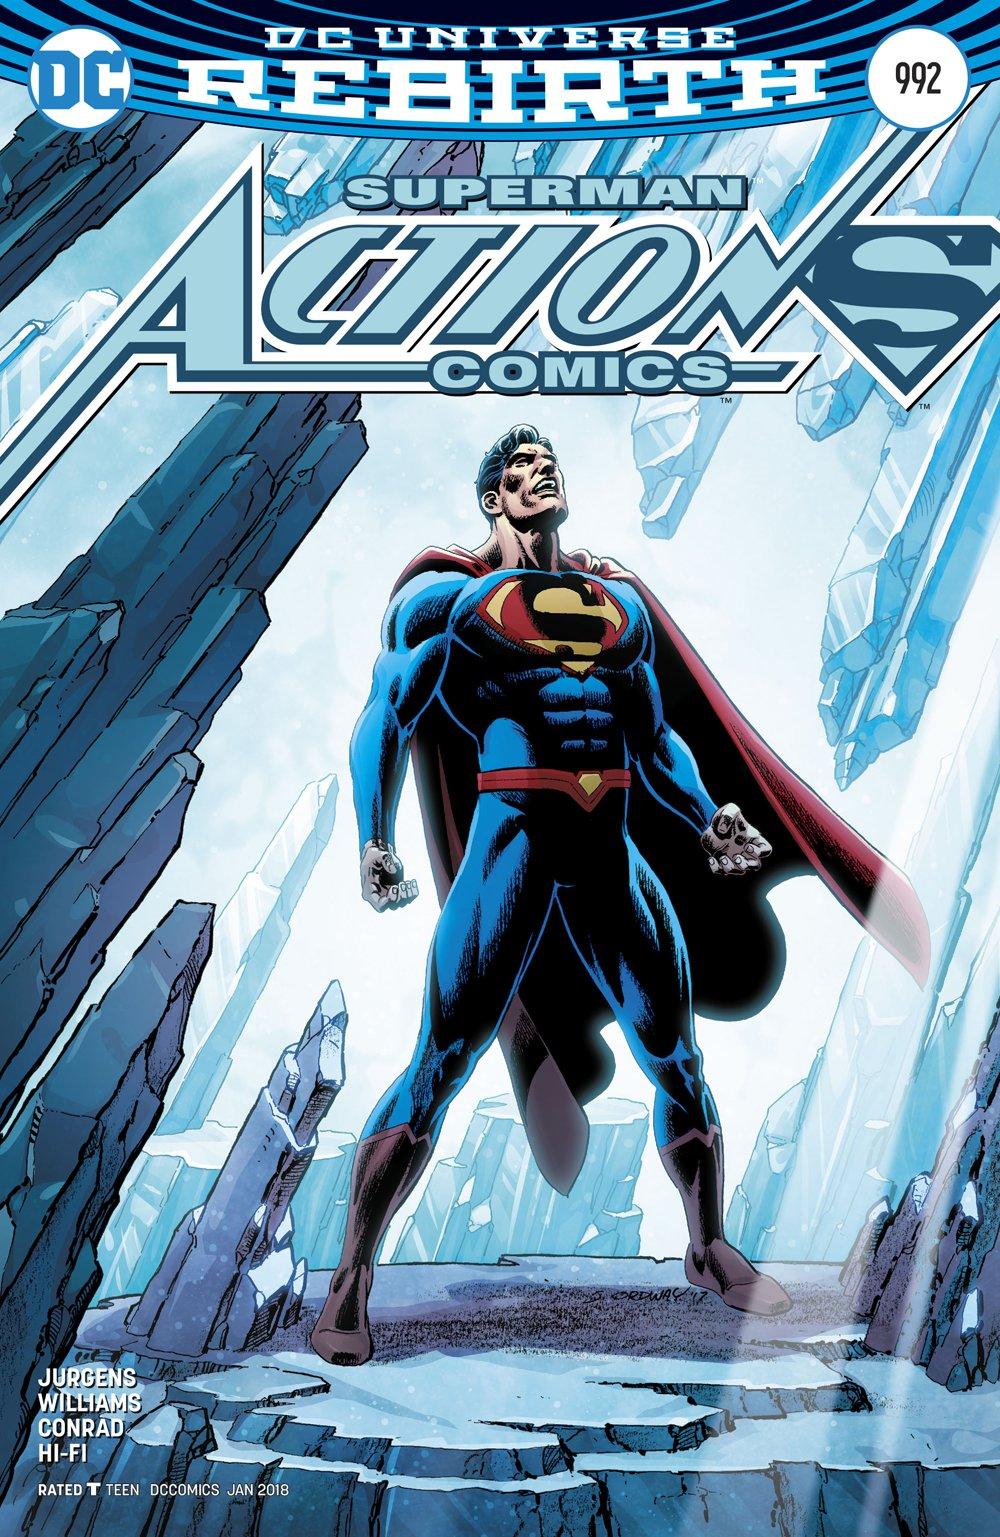 ACTION COMICS #992 ((DC REBIRTH)) ((Variant Cover)) - DC